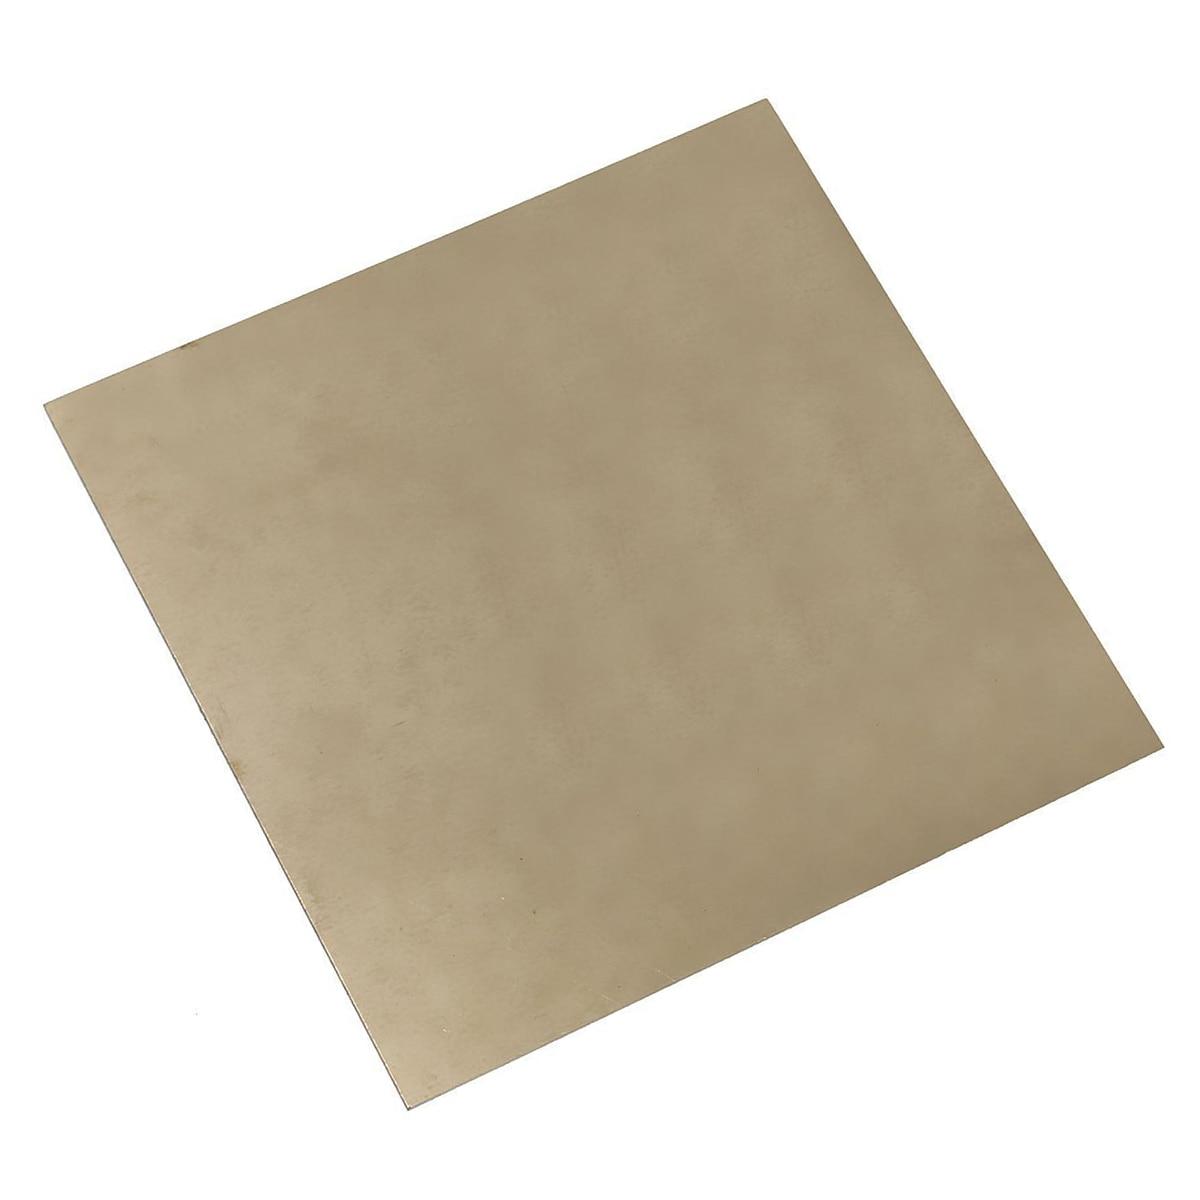 1pc Grade 2 Titanium Sheet High Strength Ti Titan TA2 / GR2 Thin Plate Titanium Foil for Aerospace Marine Industry 100*100*0.5mm 1pc new titanium plate sheet ti metal for industry tool 100 100 0 5